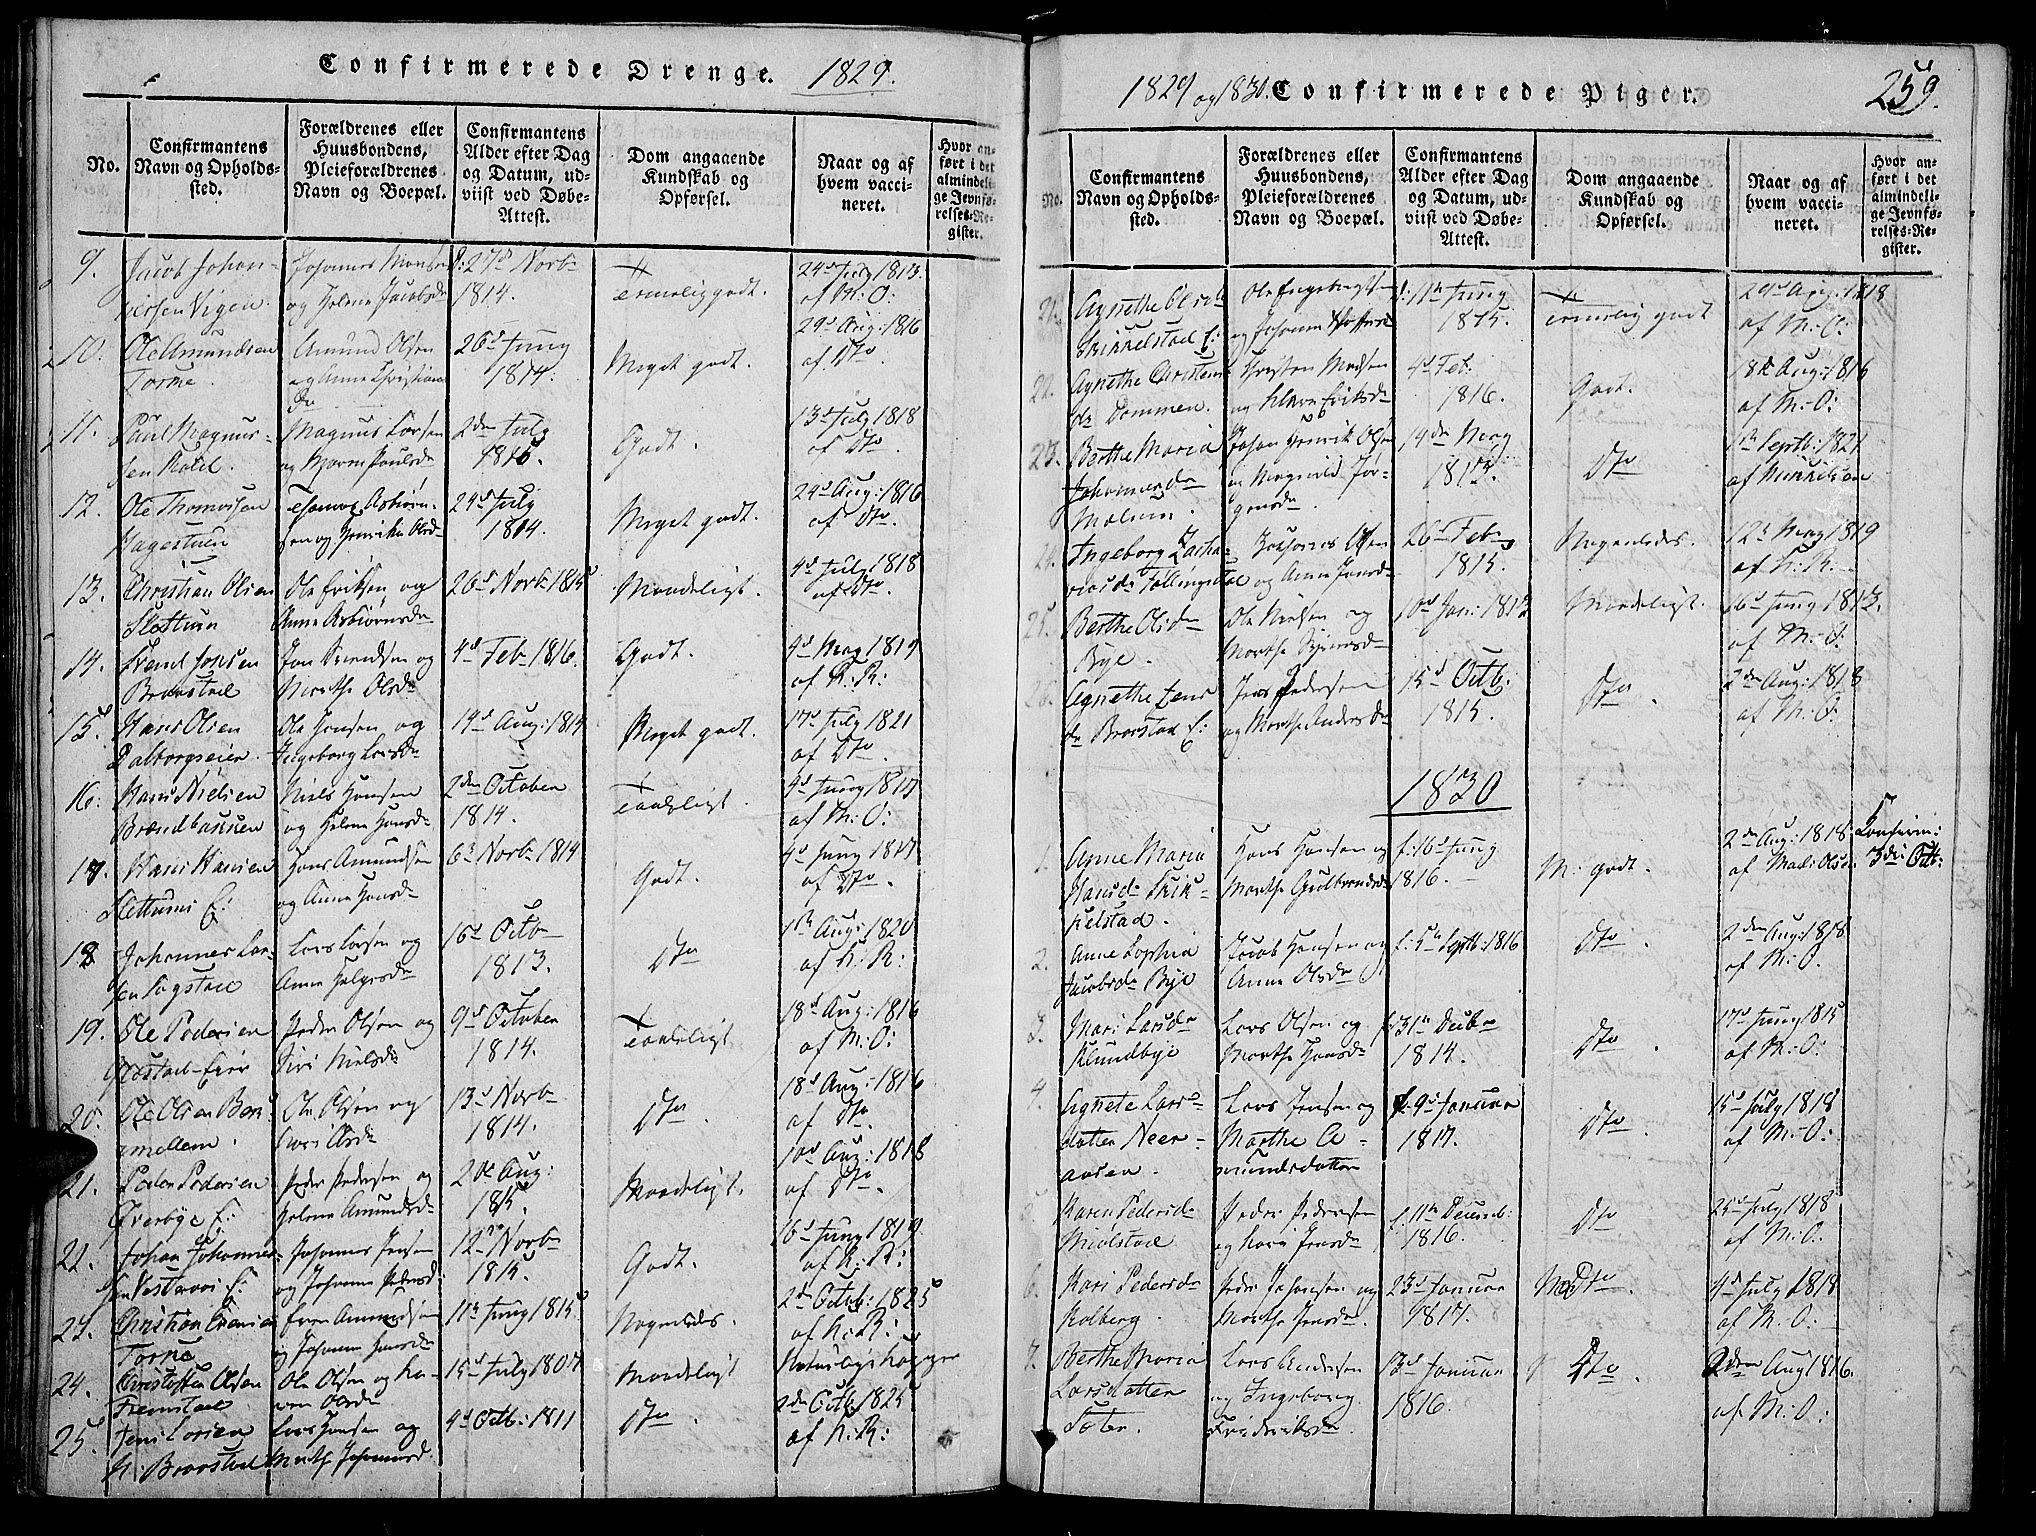 SAH, Vardal prestekontor, H/Ha/Haa/L0004: Ministerialbok nr. 4, 1814-1831, s. 259